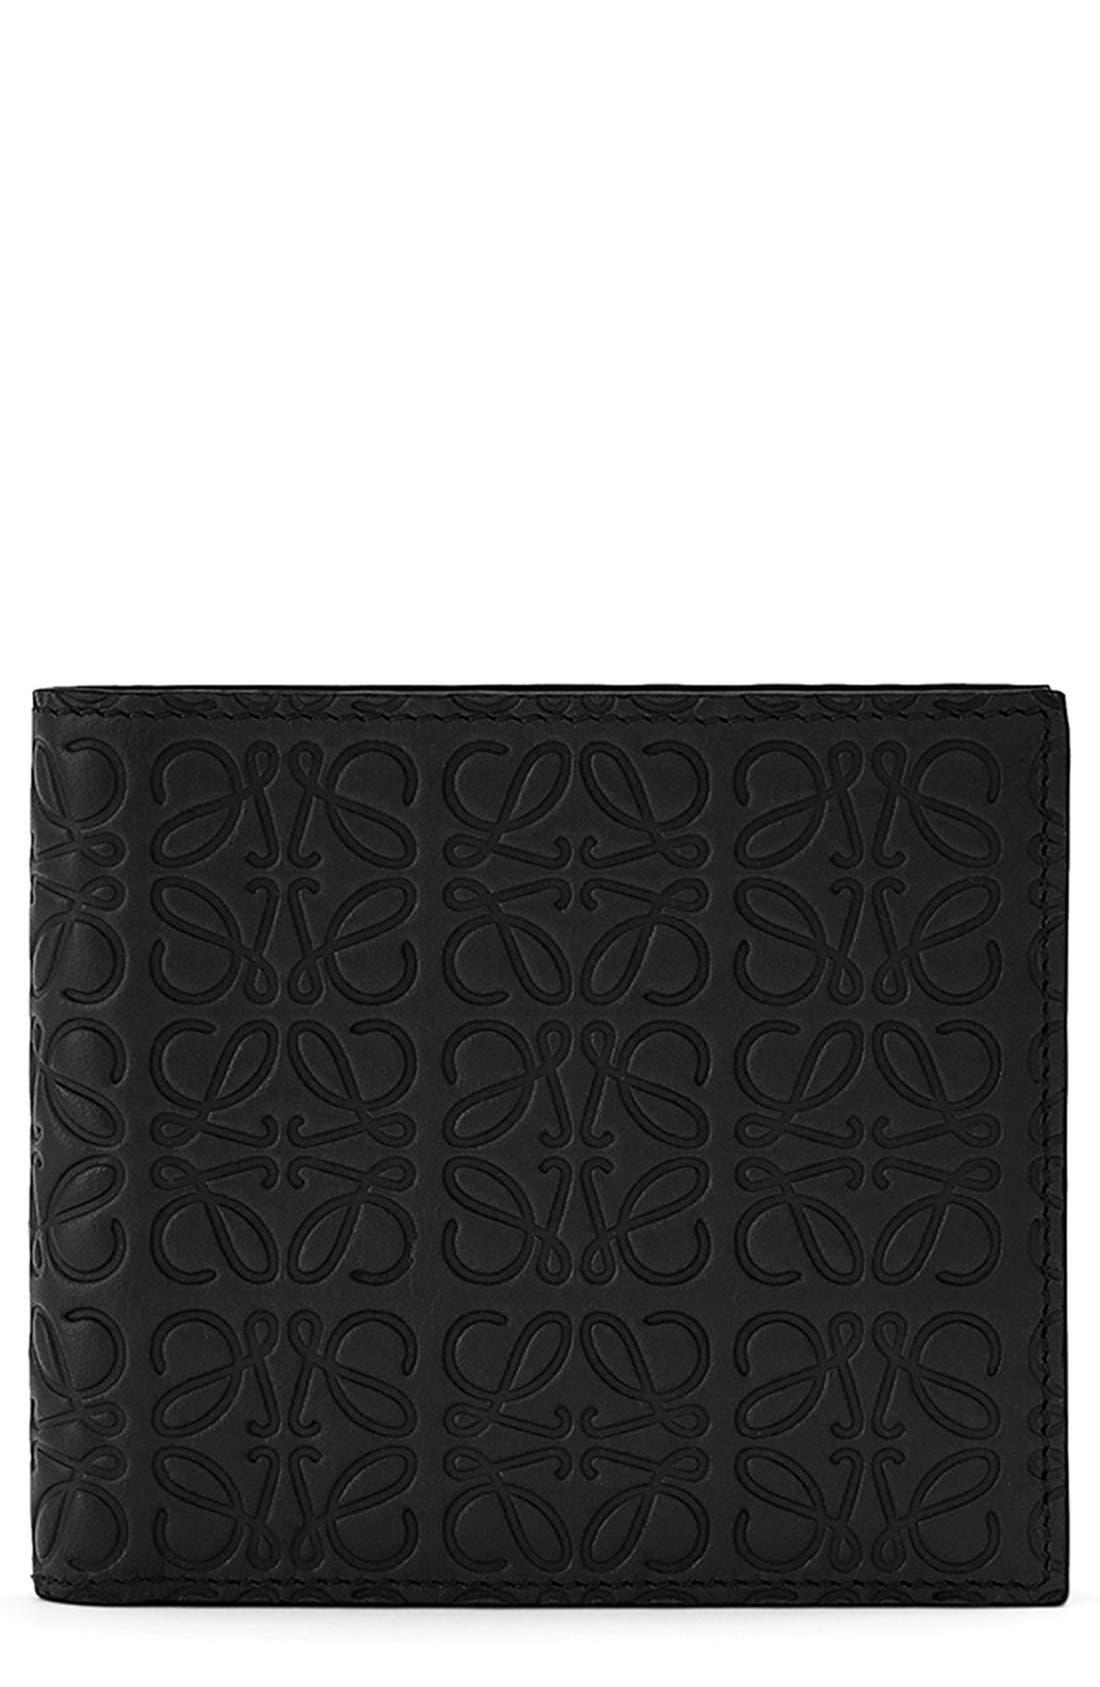 Alternate Image 1 Selected - Loewe Logo Embossed Calfskin Leather Bifold Wallet